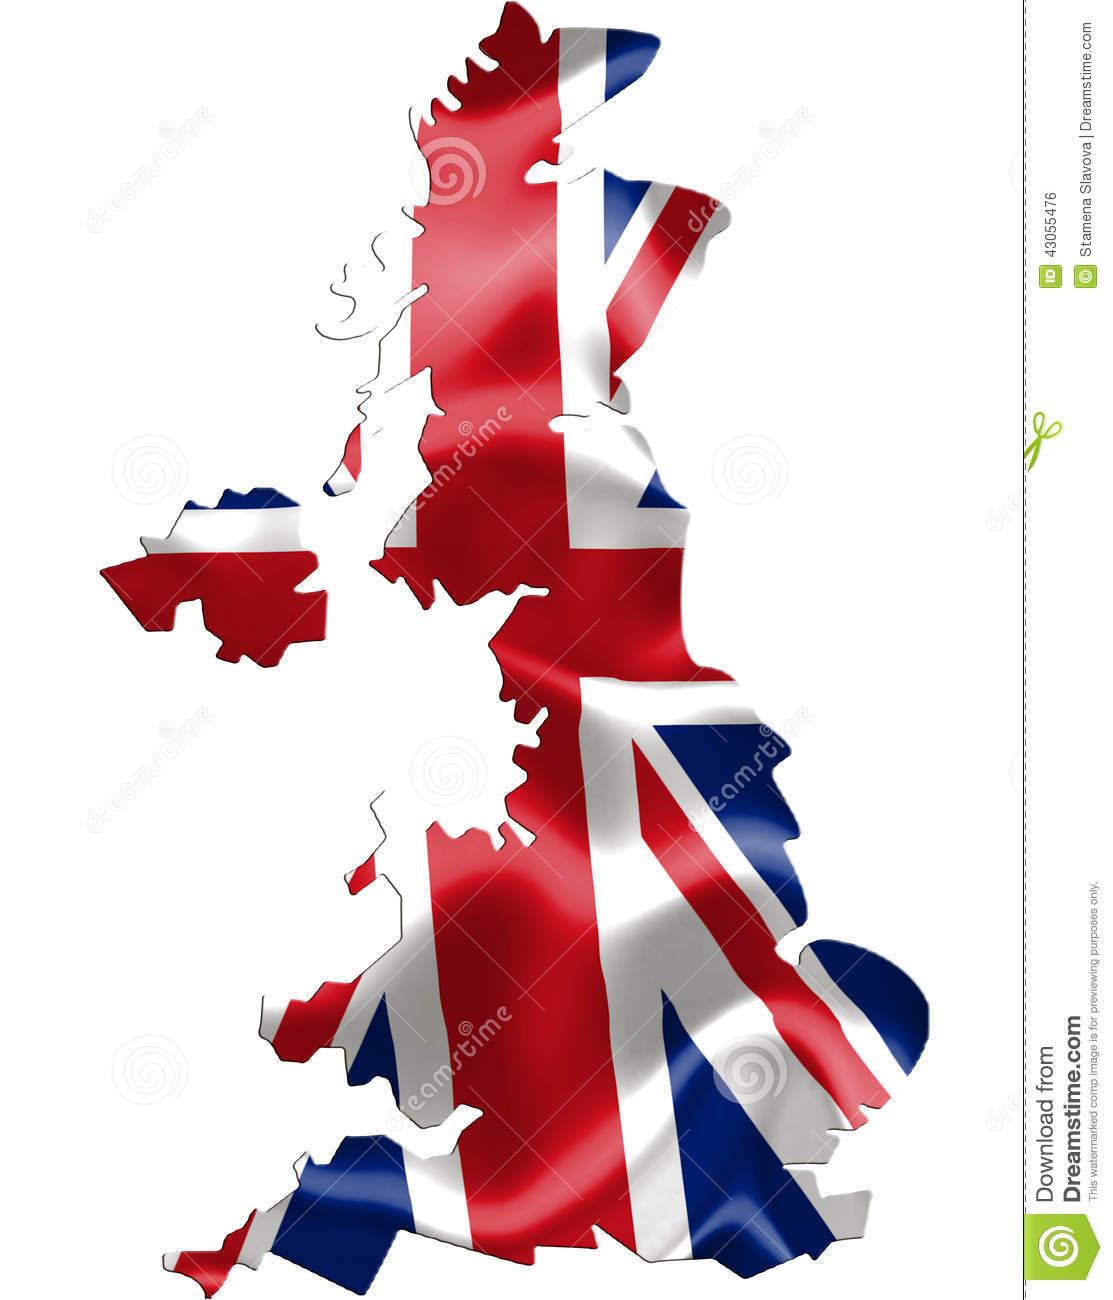 United kingdom map clipart image freeuse library UK United Kingdom Map With Flag Stock Illustration - Image: 43055476 image freeuse library